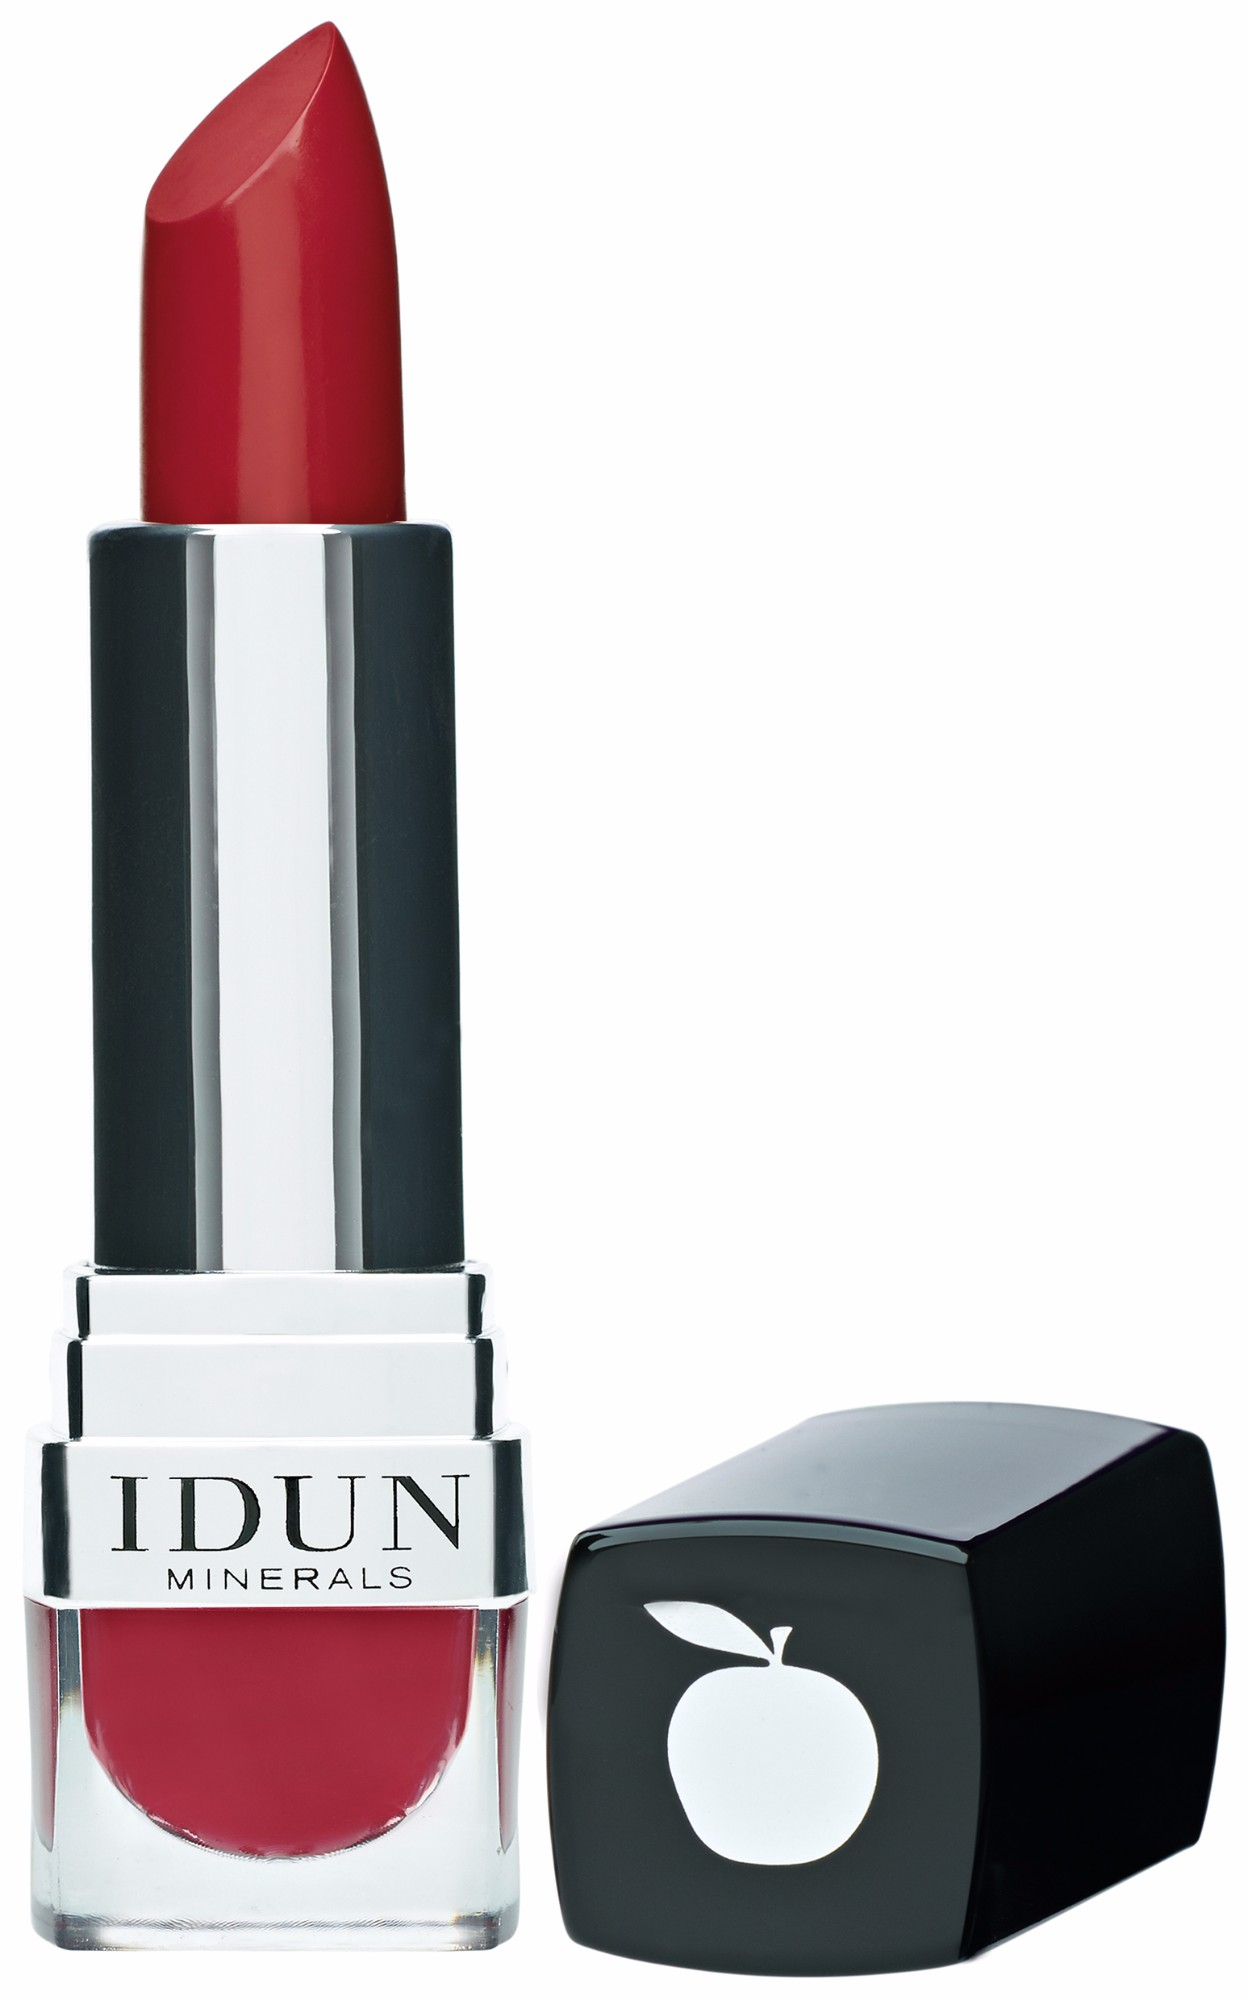 Matiniai lūpų dažai IDUN MINERALS Jordgubb, 4 g